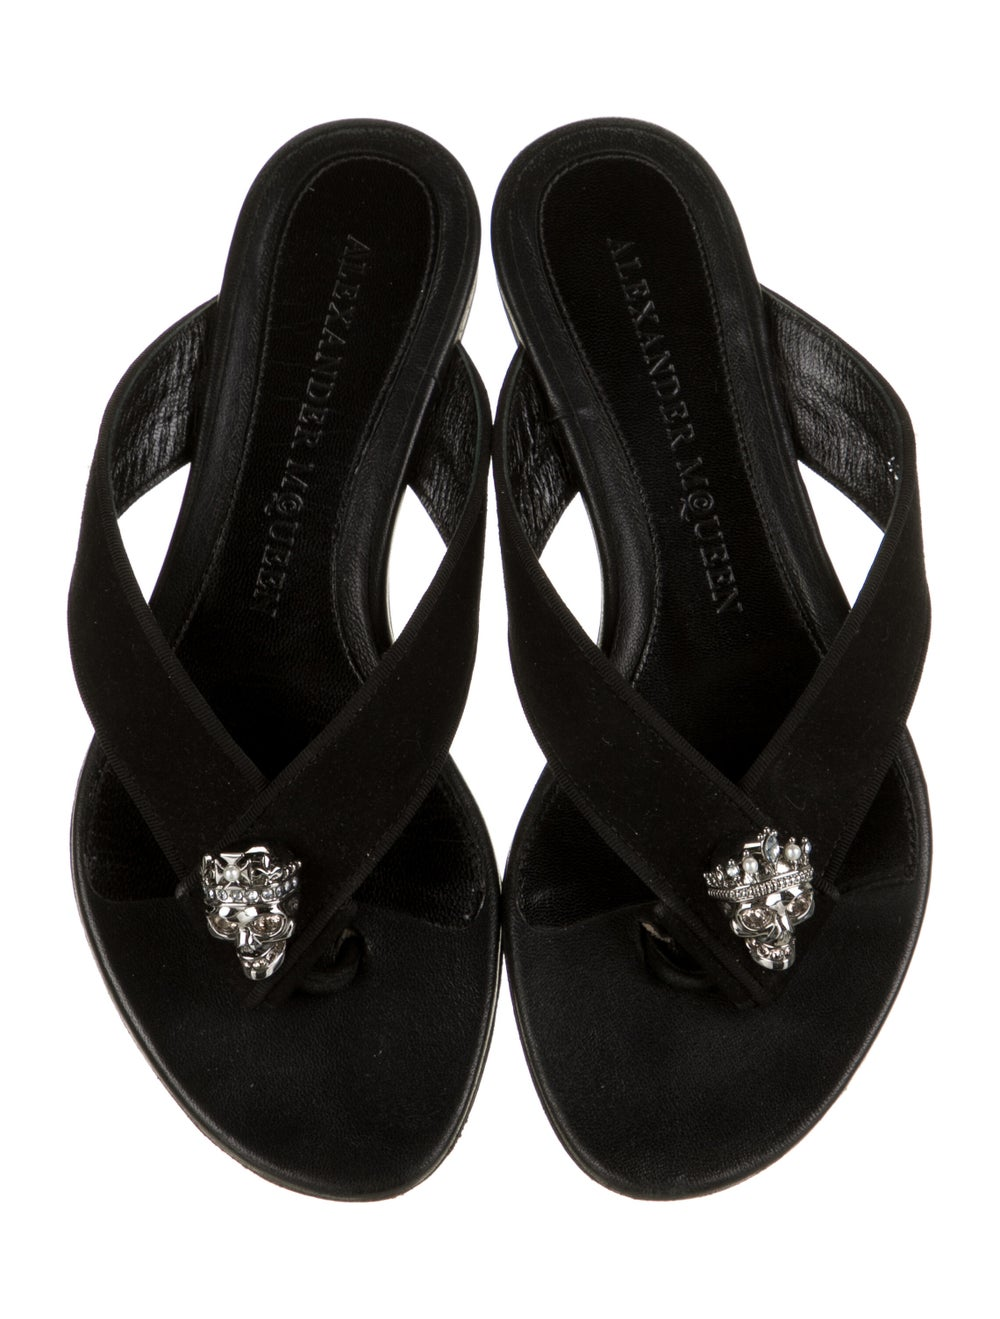 Alexander McQueen Suede Slides Black - image 3